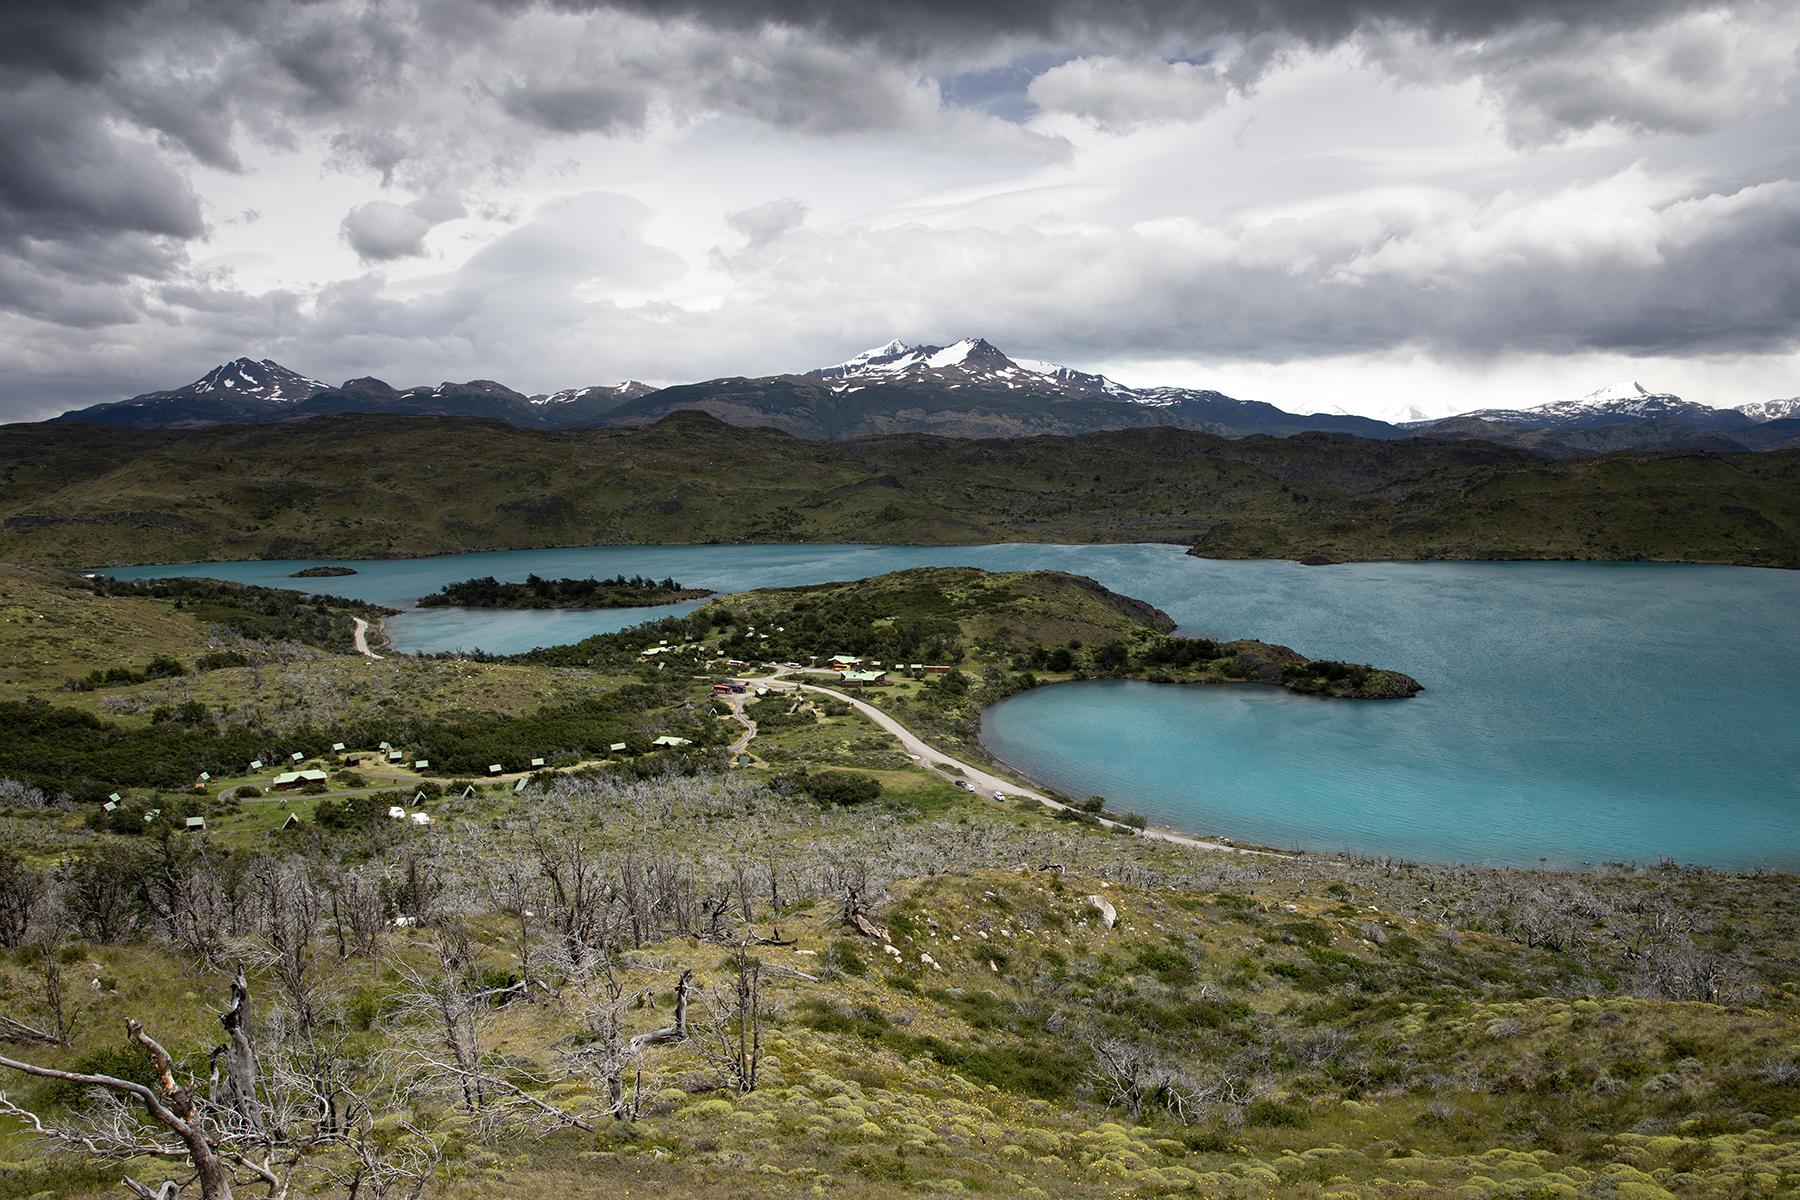 Vue lac pehoe chili